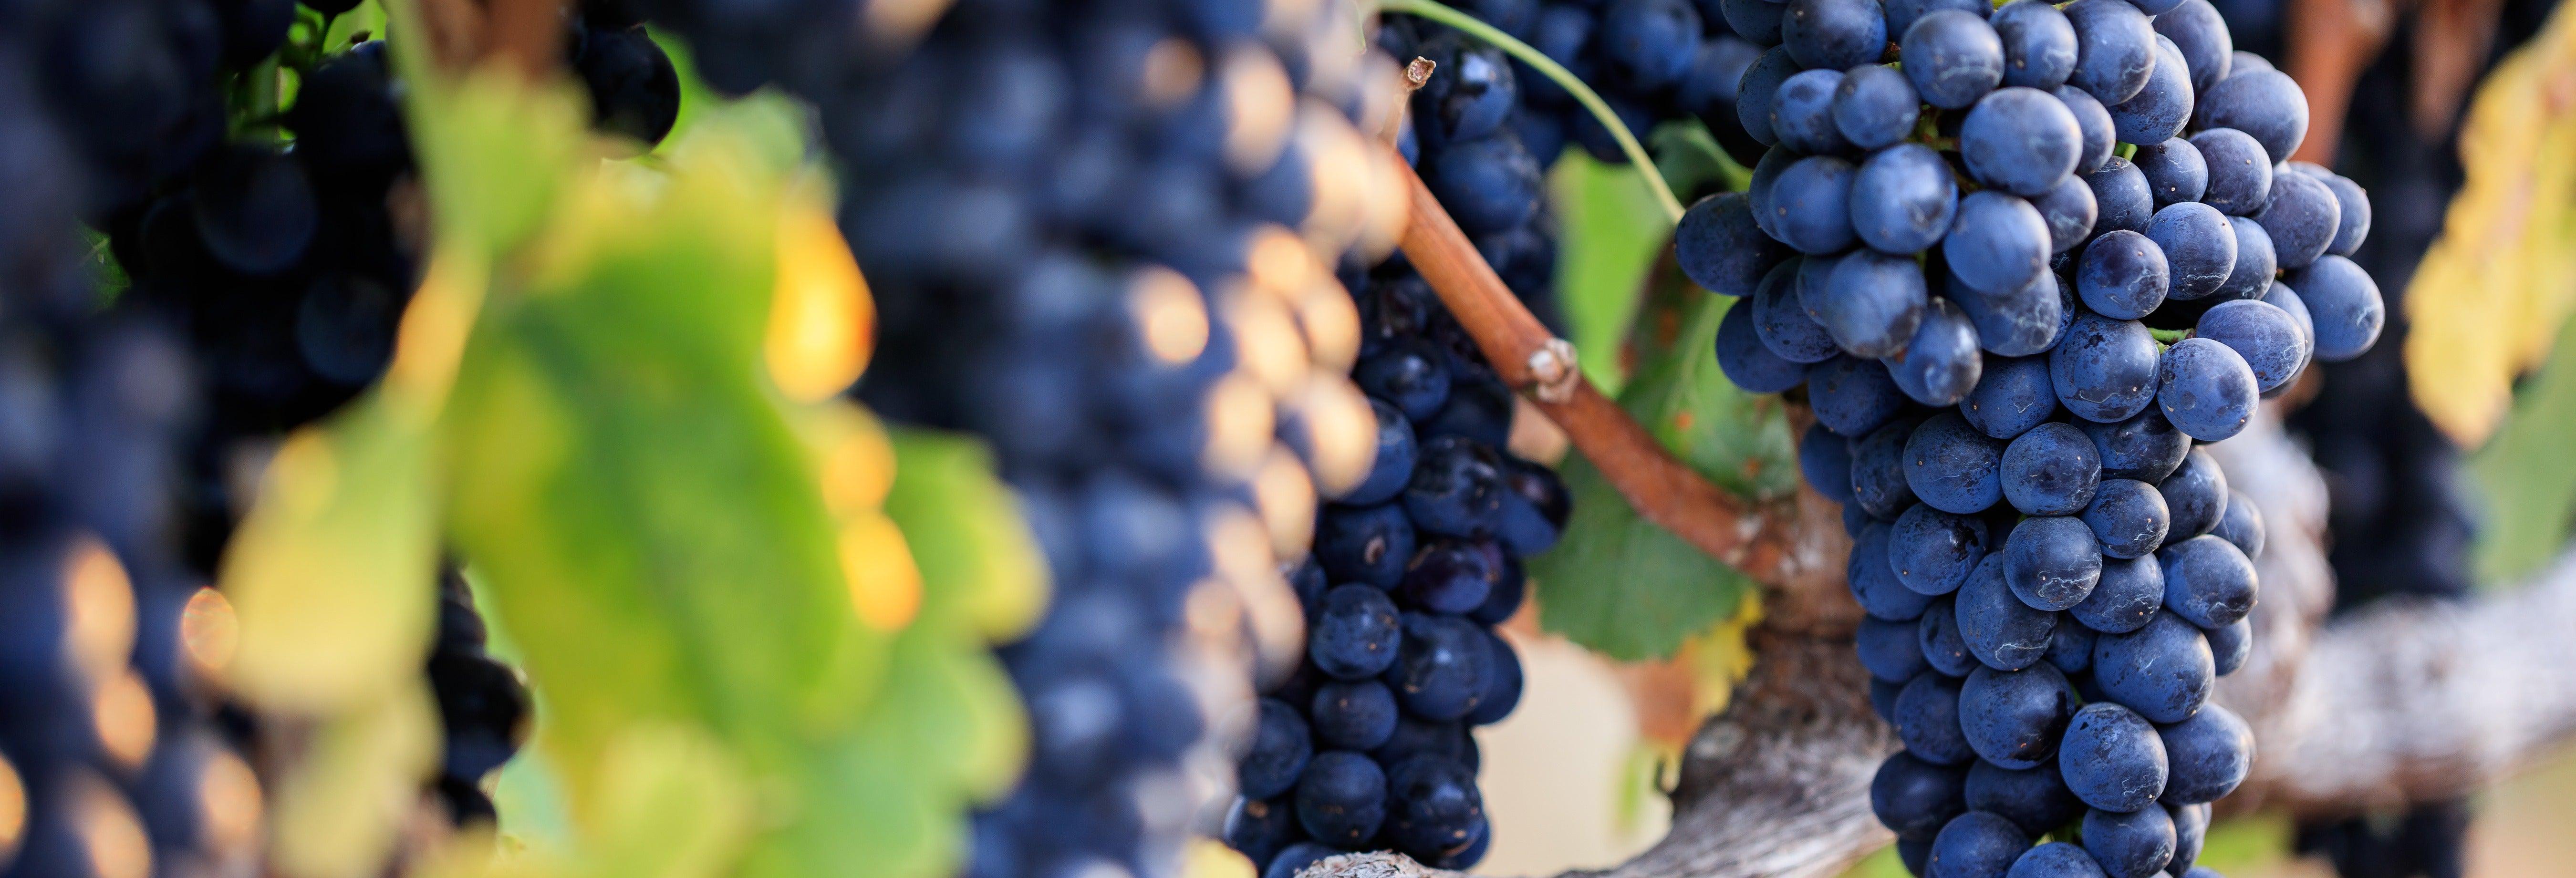 Tour del vino por Guanajuato